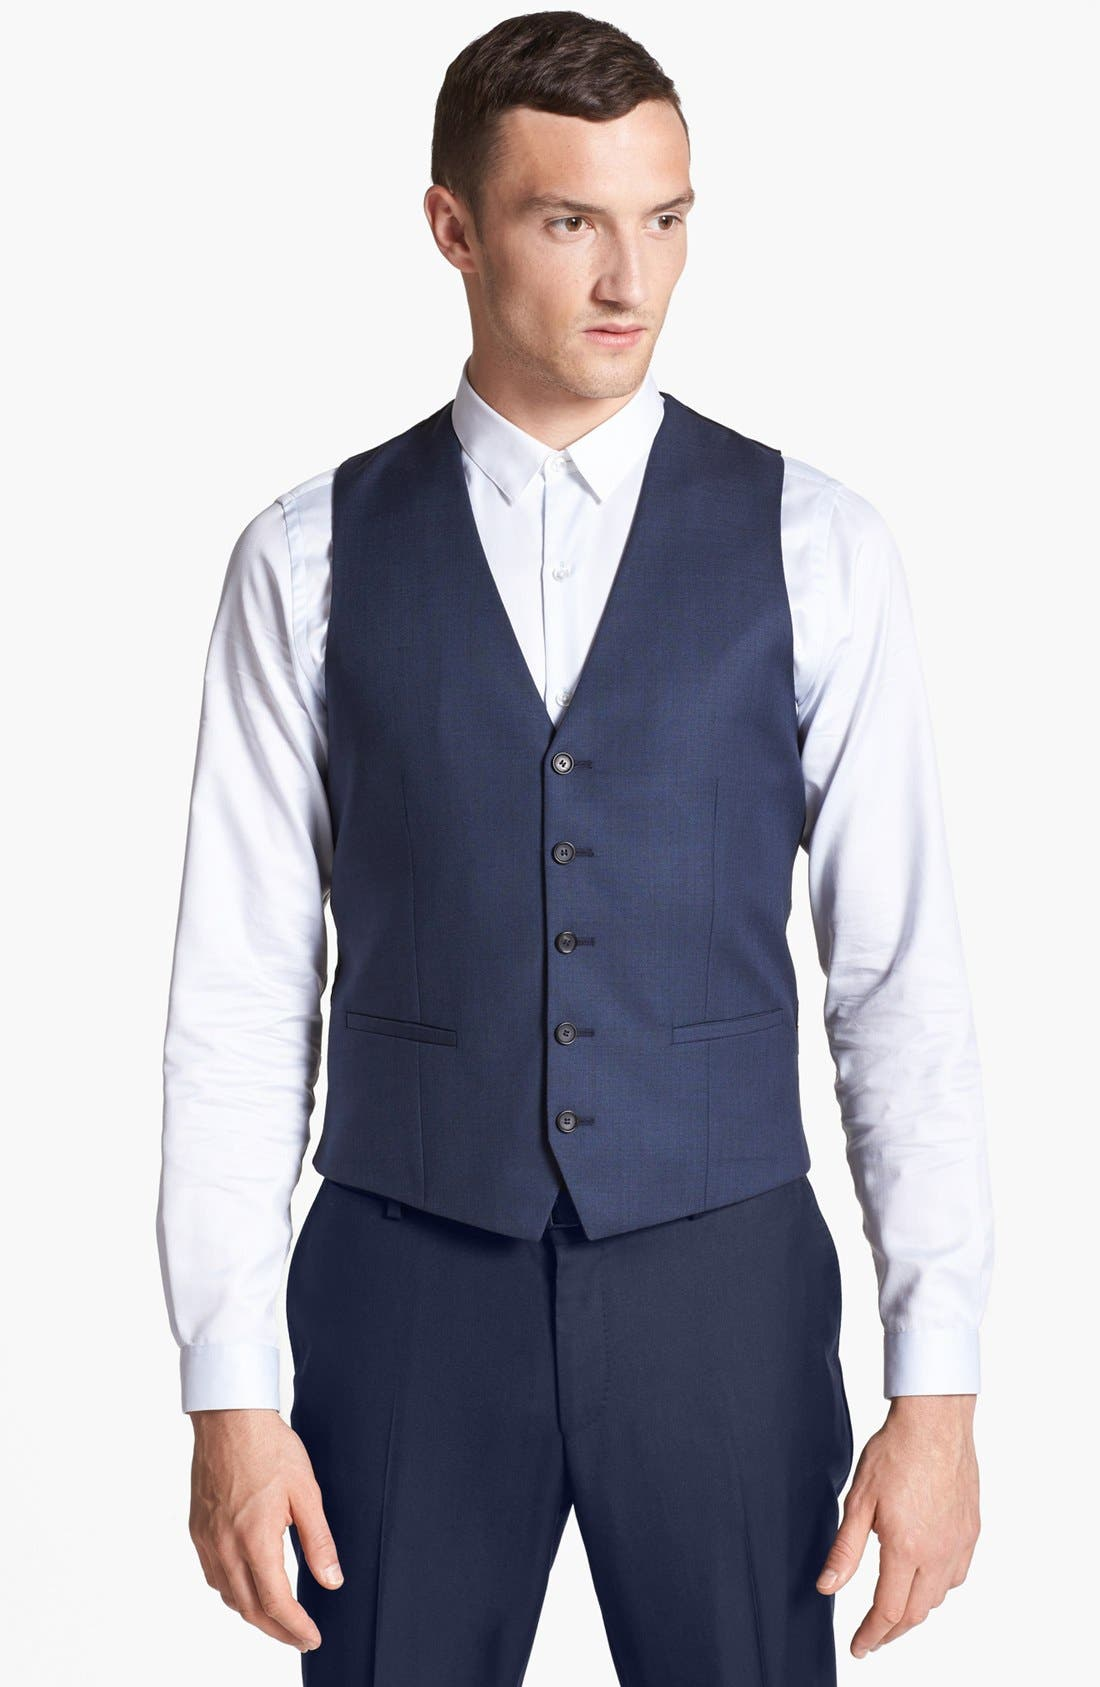 Main Image - The Kooples Navy Wool Vest